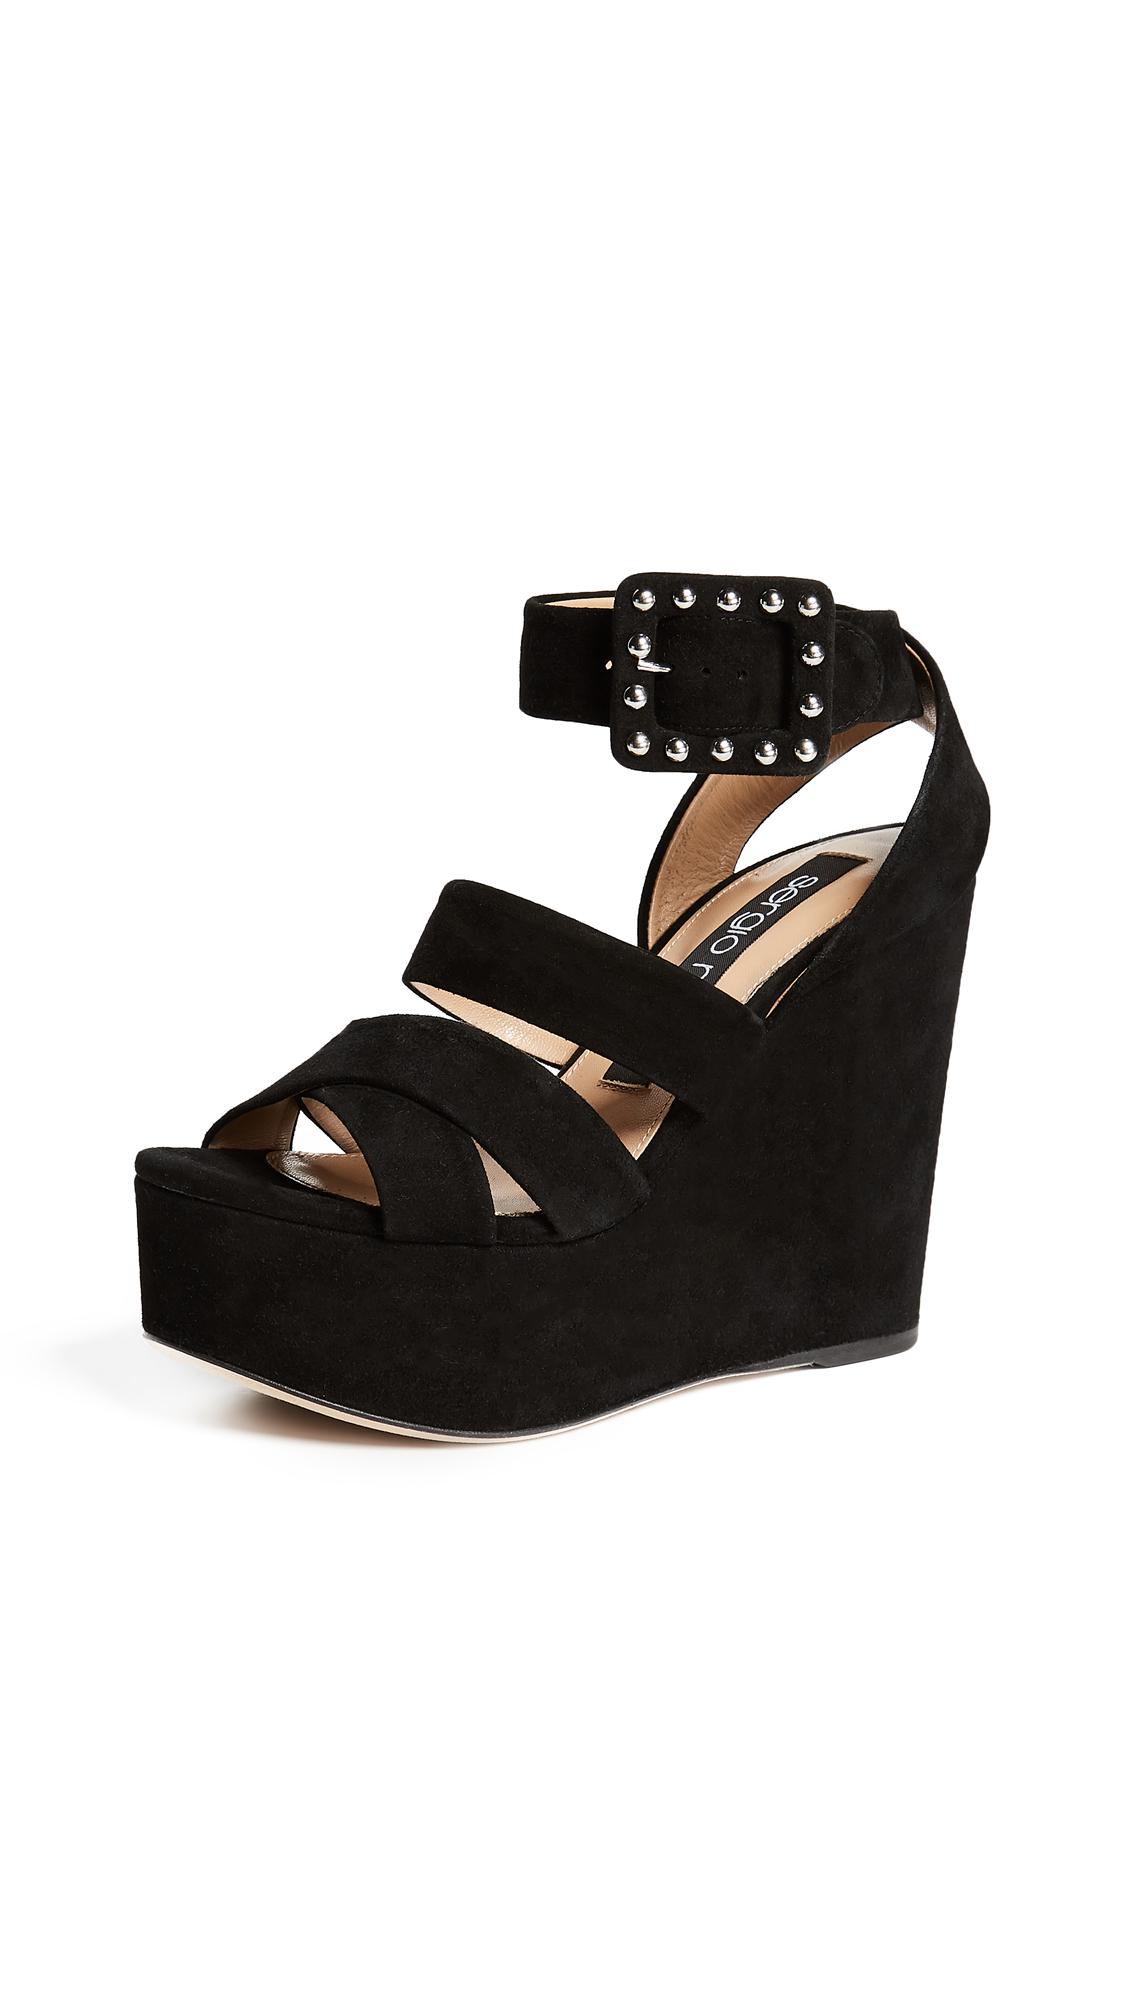 Sergio Rossi Elettra Strappy Platform Sandals - Black